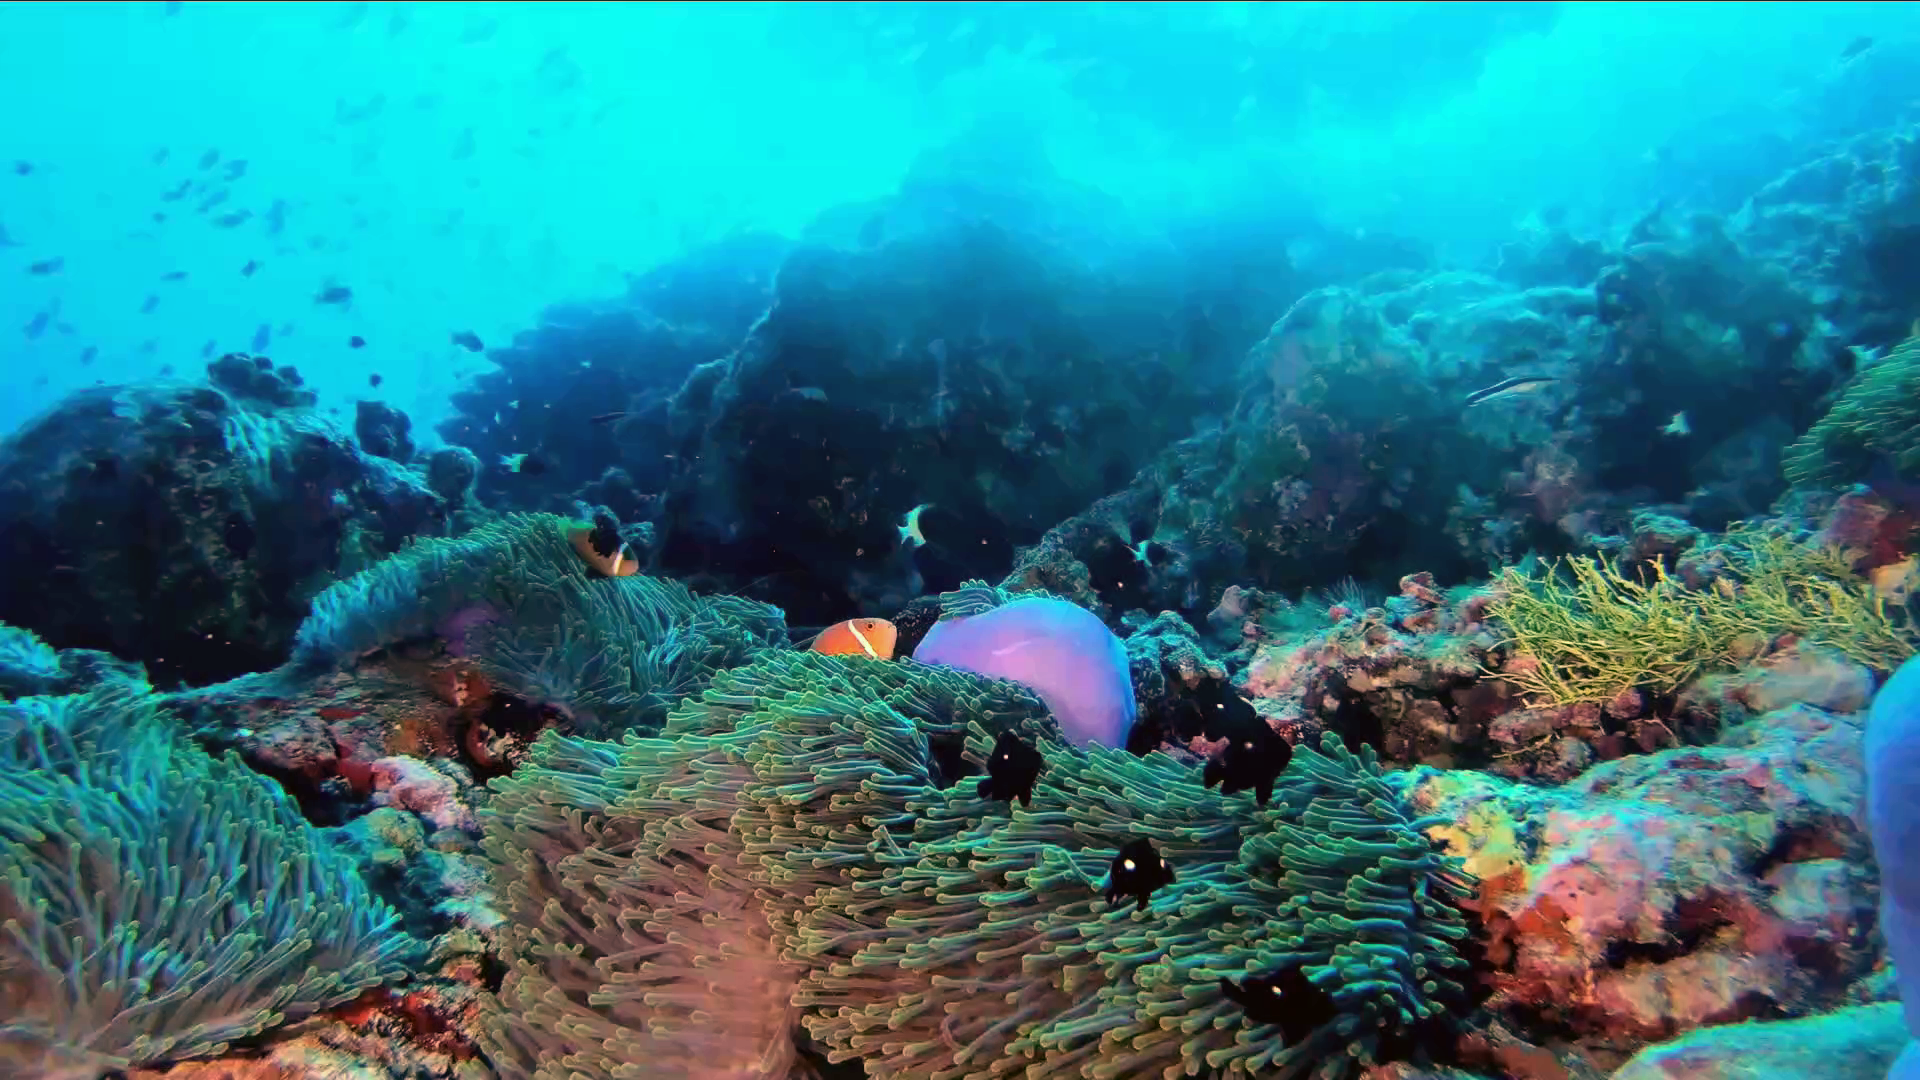 anemone Ritteri - magnificent sea anemone - anemone magnifica - Heteractis magnifica - intotheblue.it